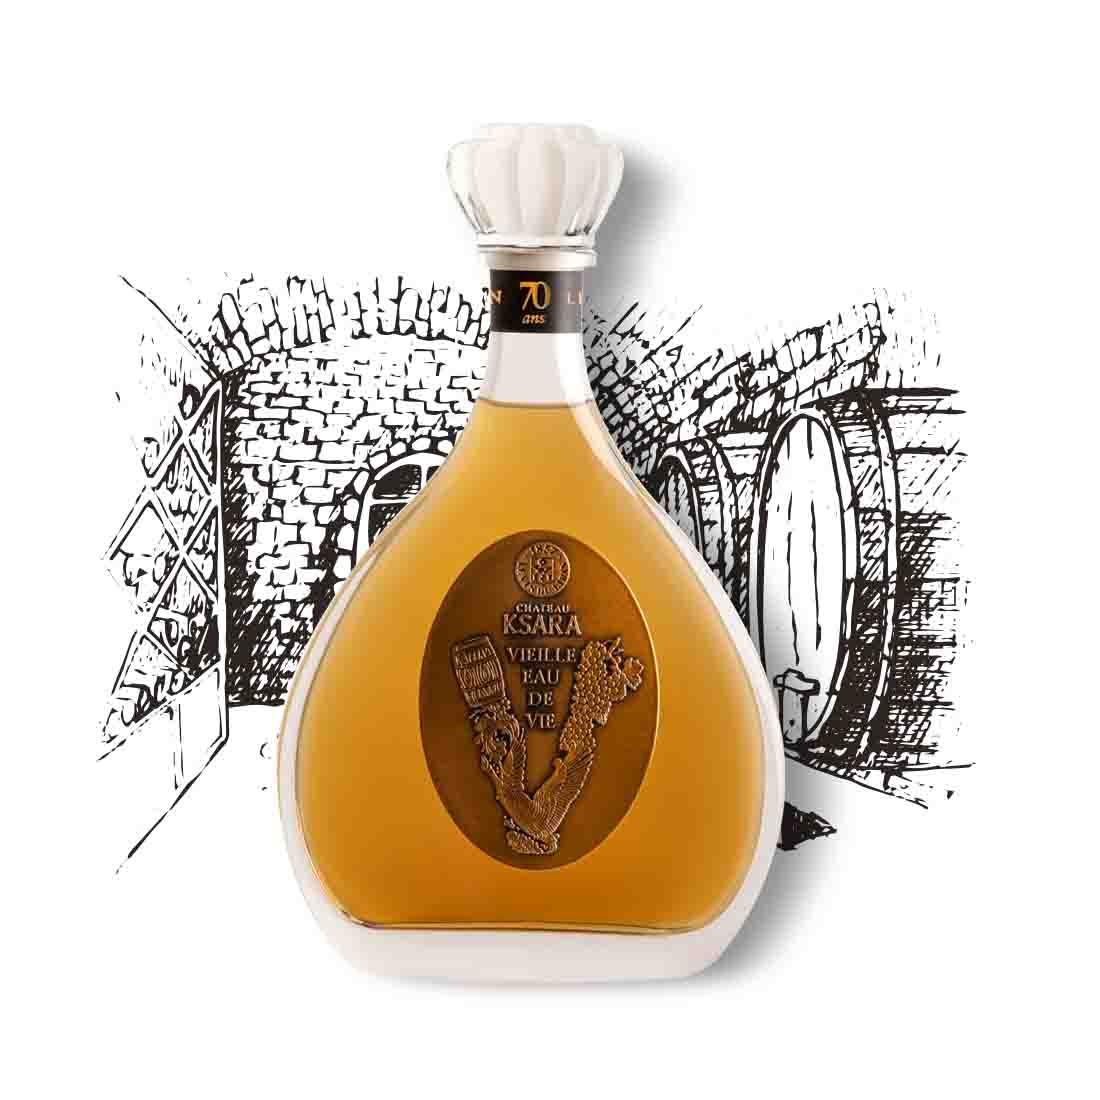 ksara vieille eau de vie de vin vintage rare collectible cognac brandy ugni blanc bekaa 70 years